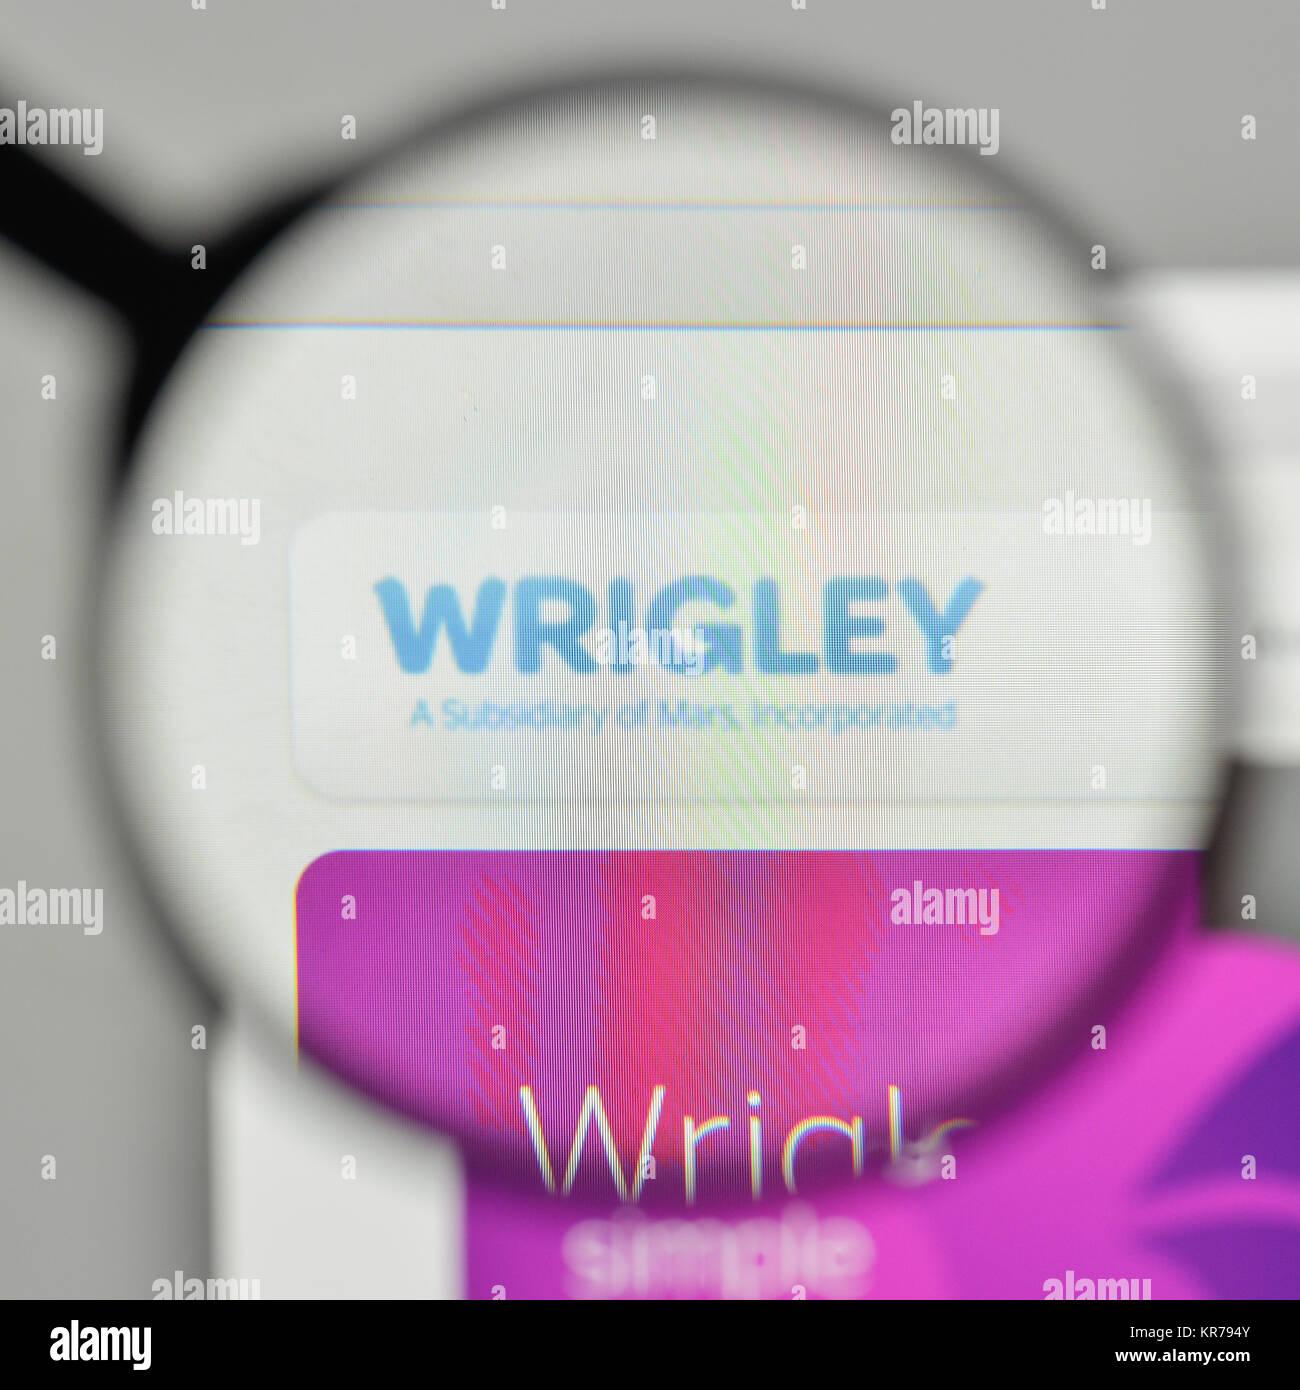 Milan italy november 1 2017 wrigleys logo on the website stock milan italy november 1 2017 wrigleys logo on the website homepage altavistaventures Images